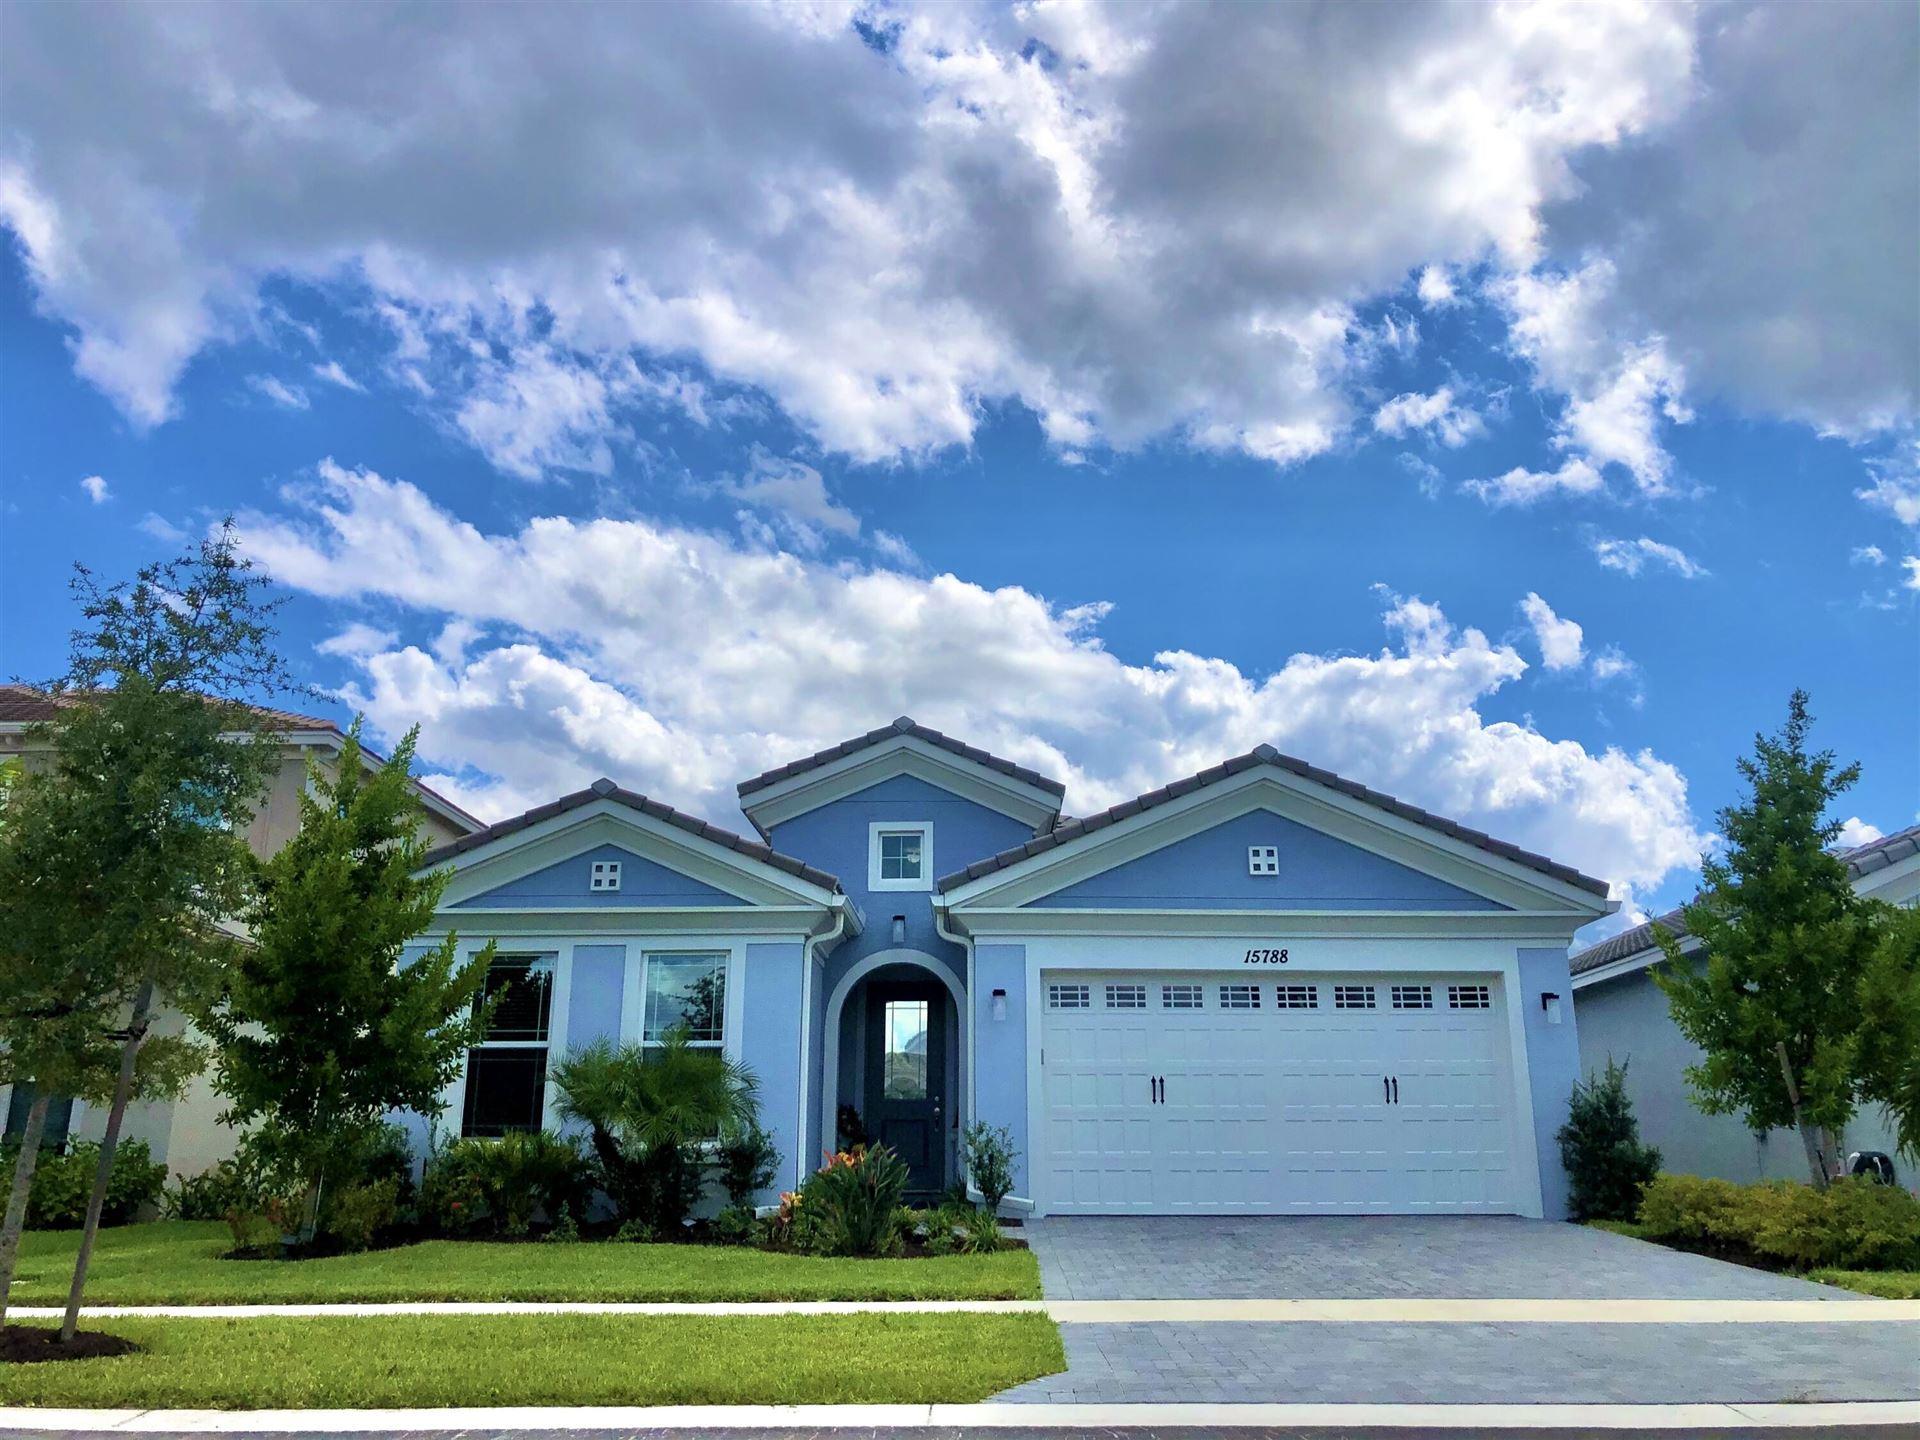 15788 Hummingbird Lane, The Acreage, FL 33470 - MLS#: RX-10747540